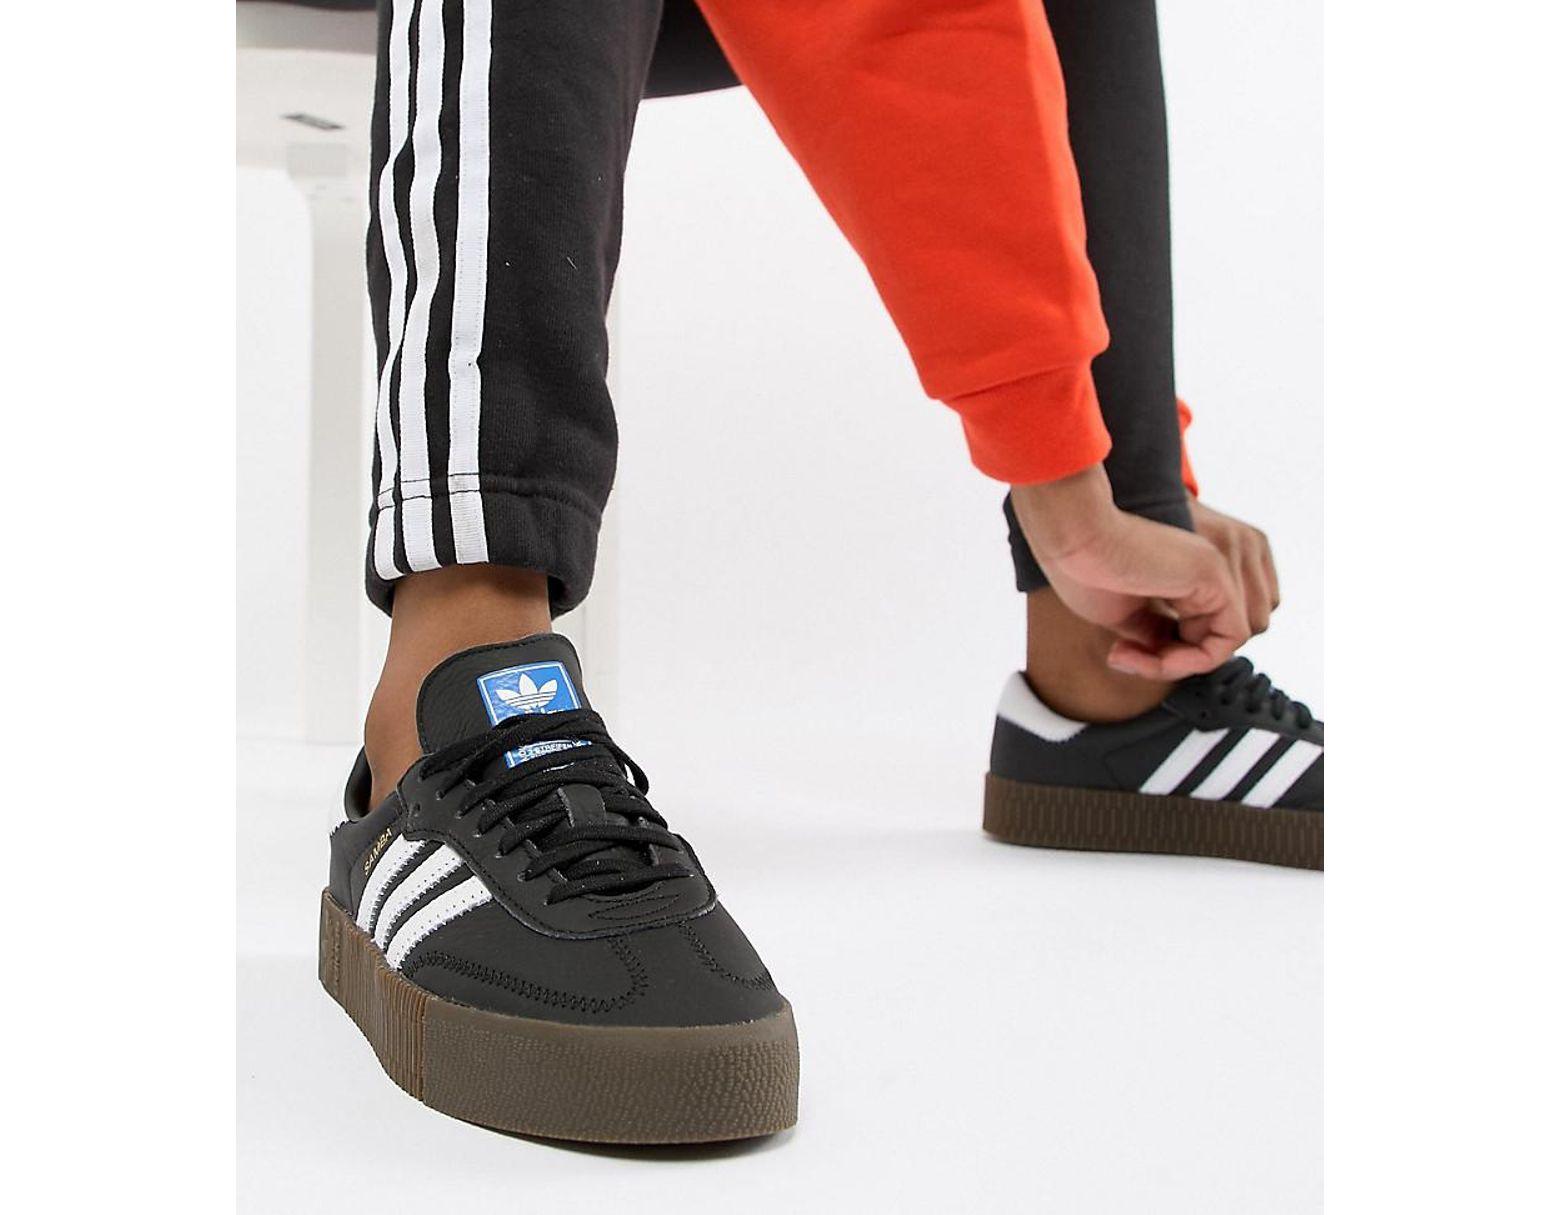 84098e4384b5 adidas Originals Samba Rose Sneakers In Black With Dark Gum Sole in Black -  Lyst